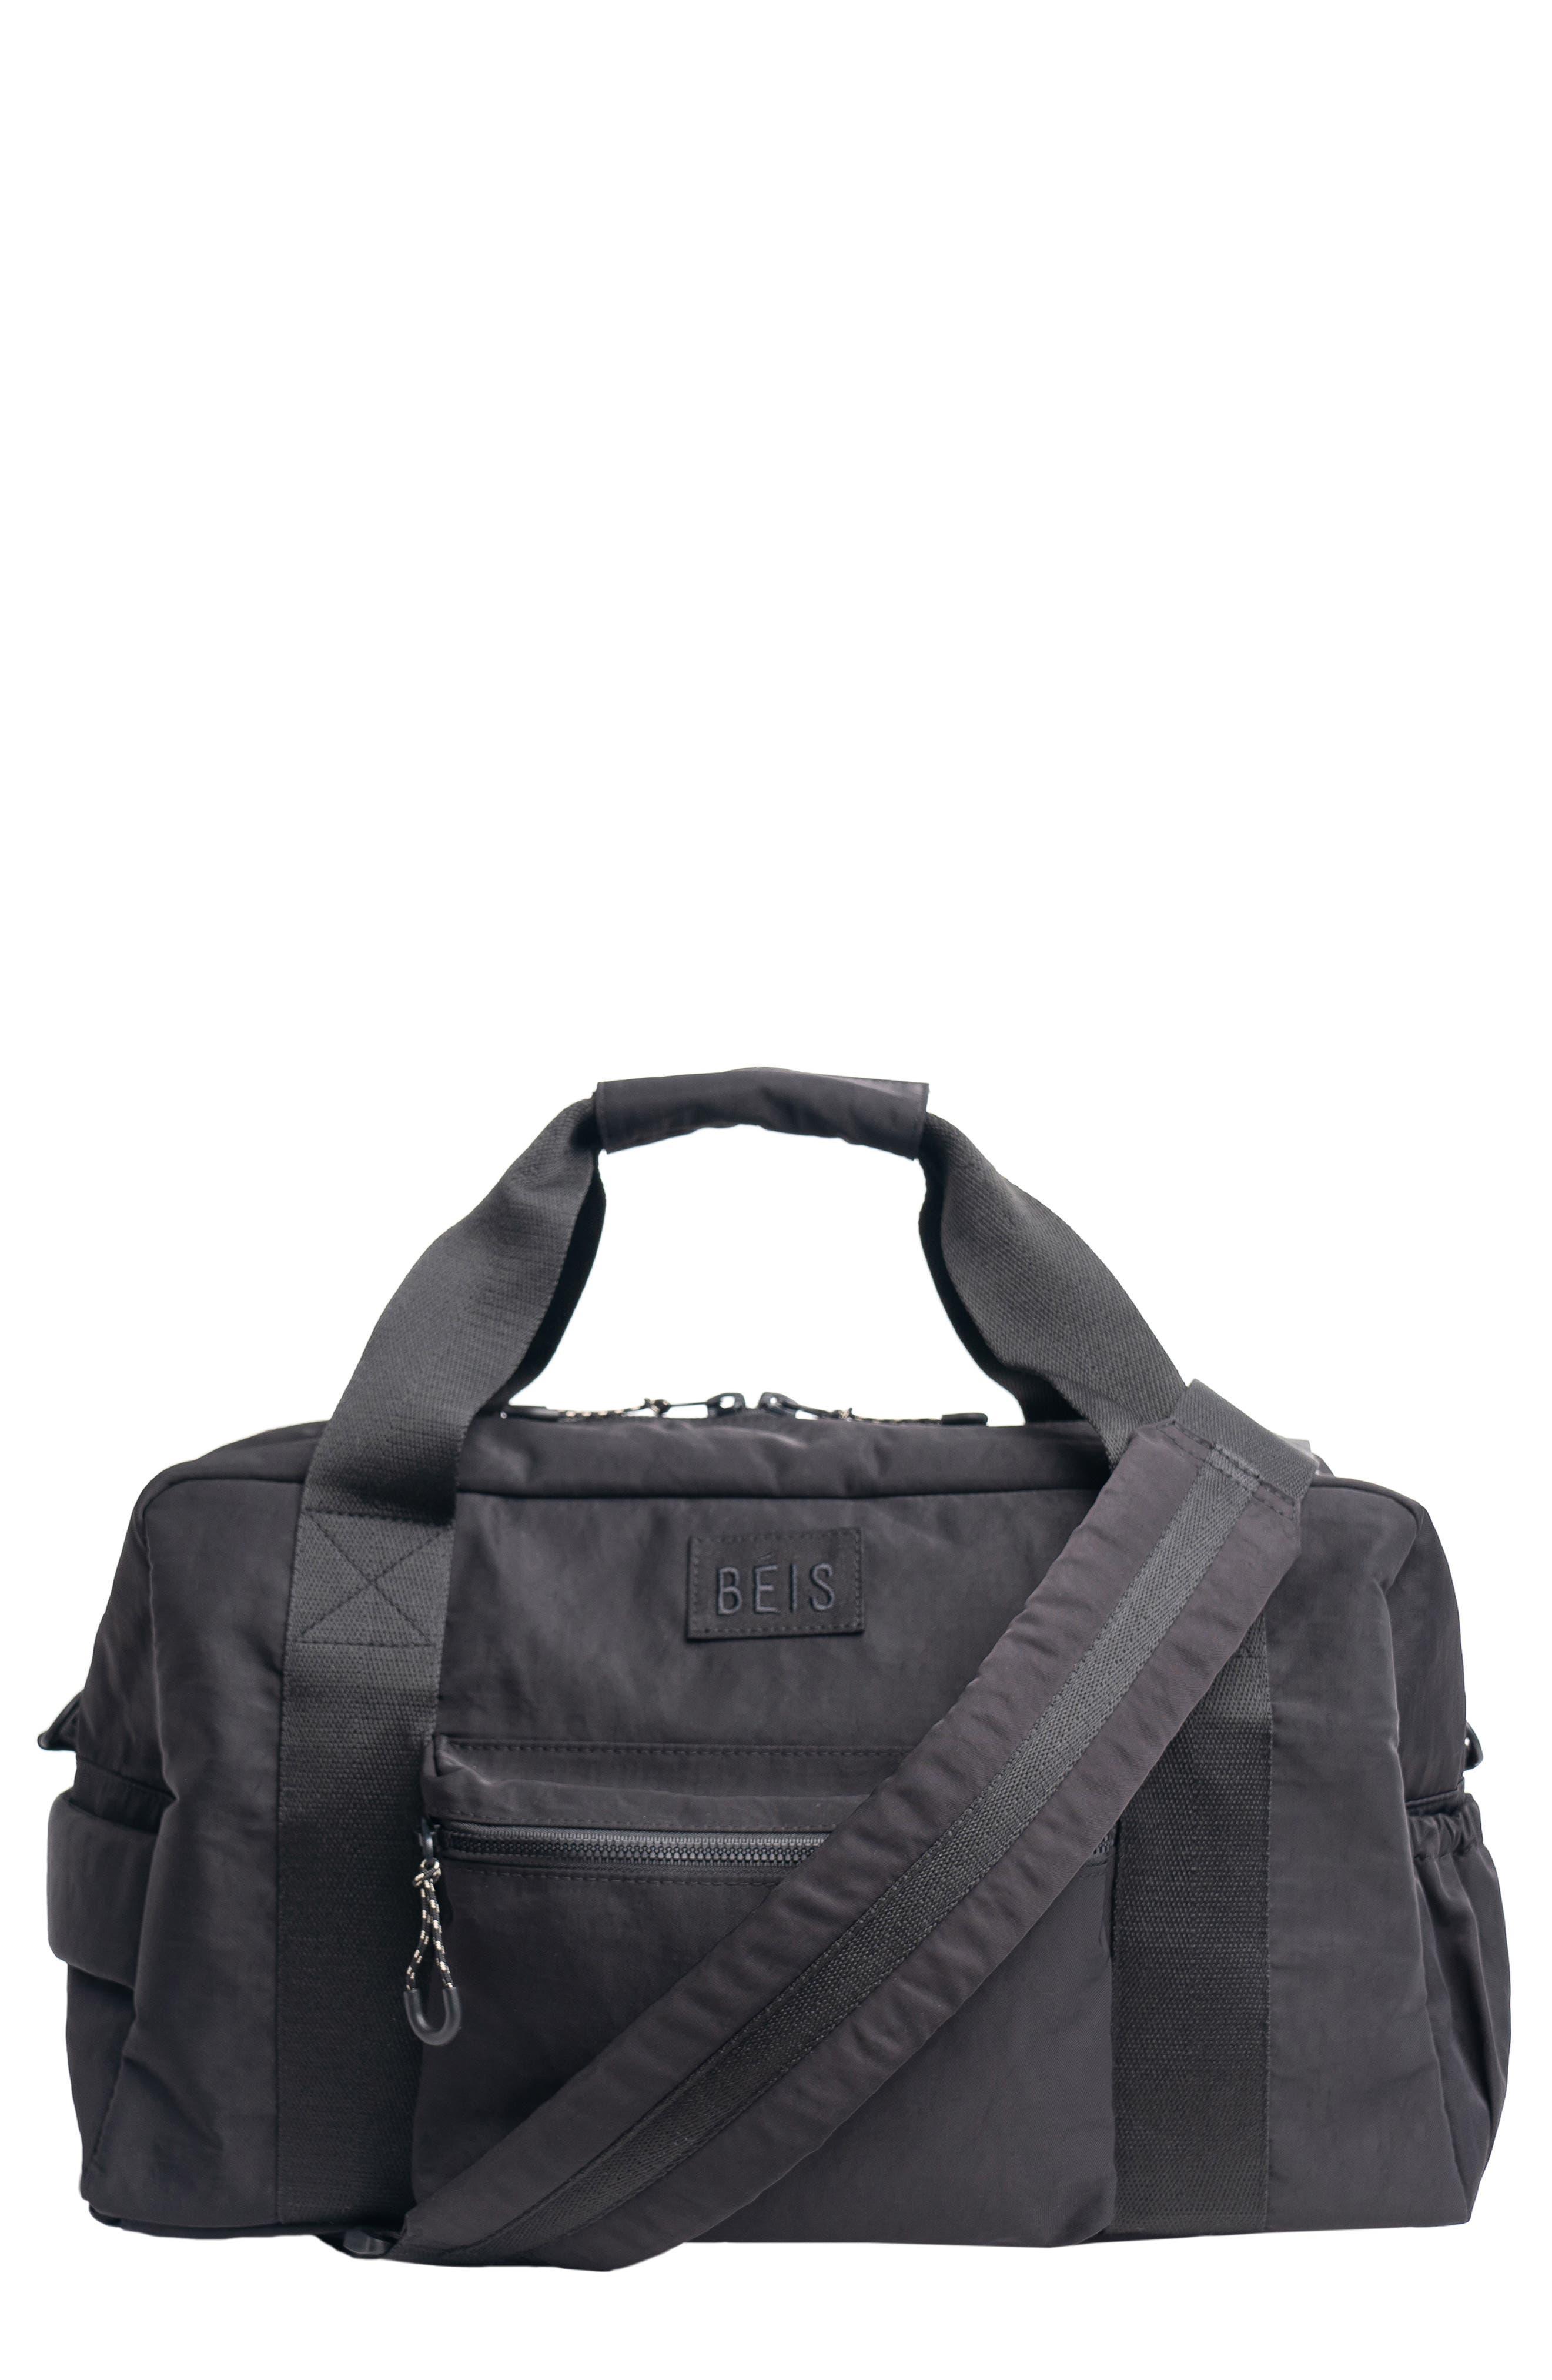 The Convertible Duffle Bag